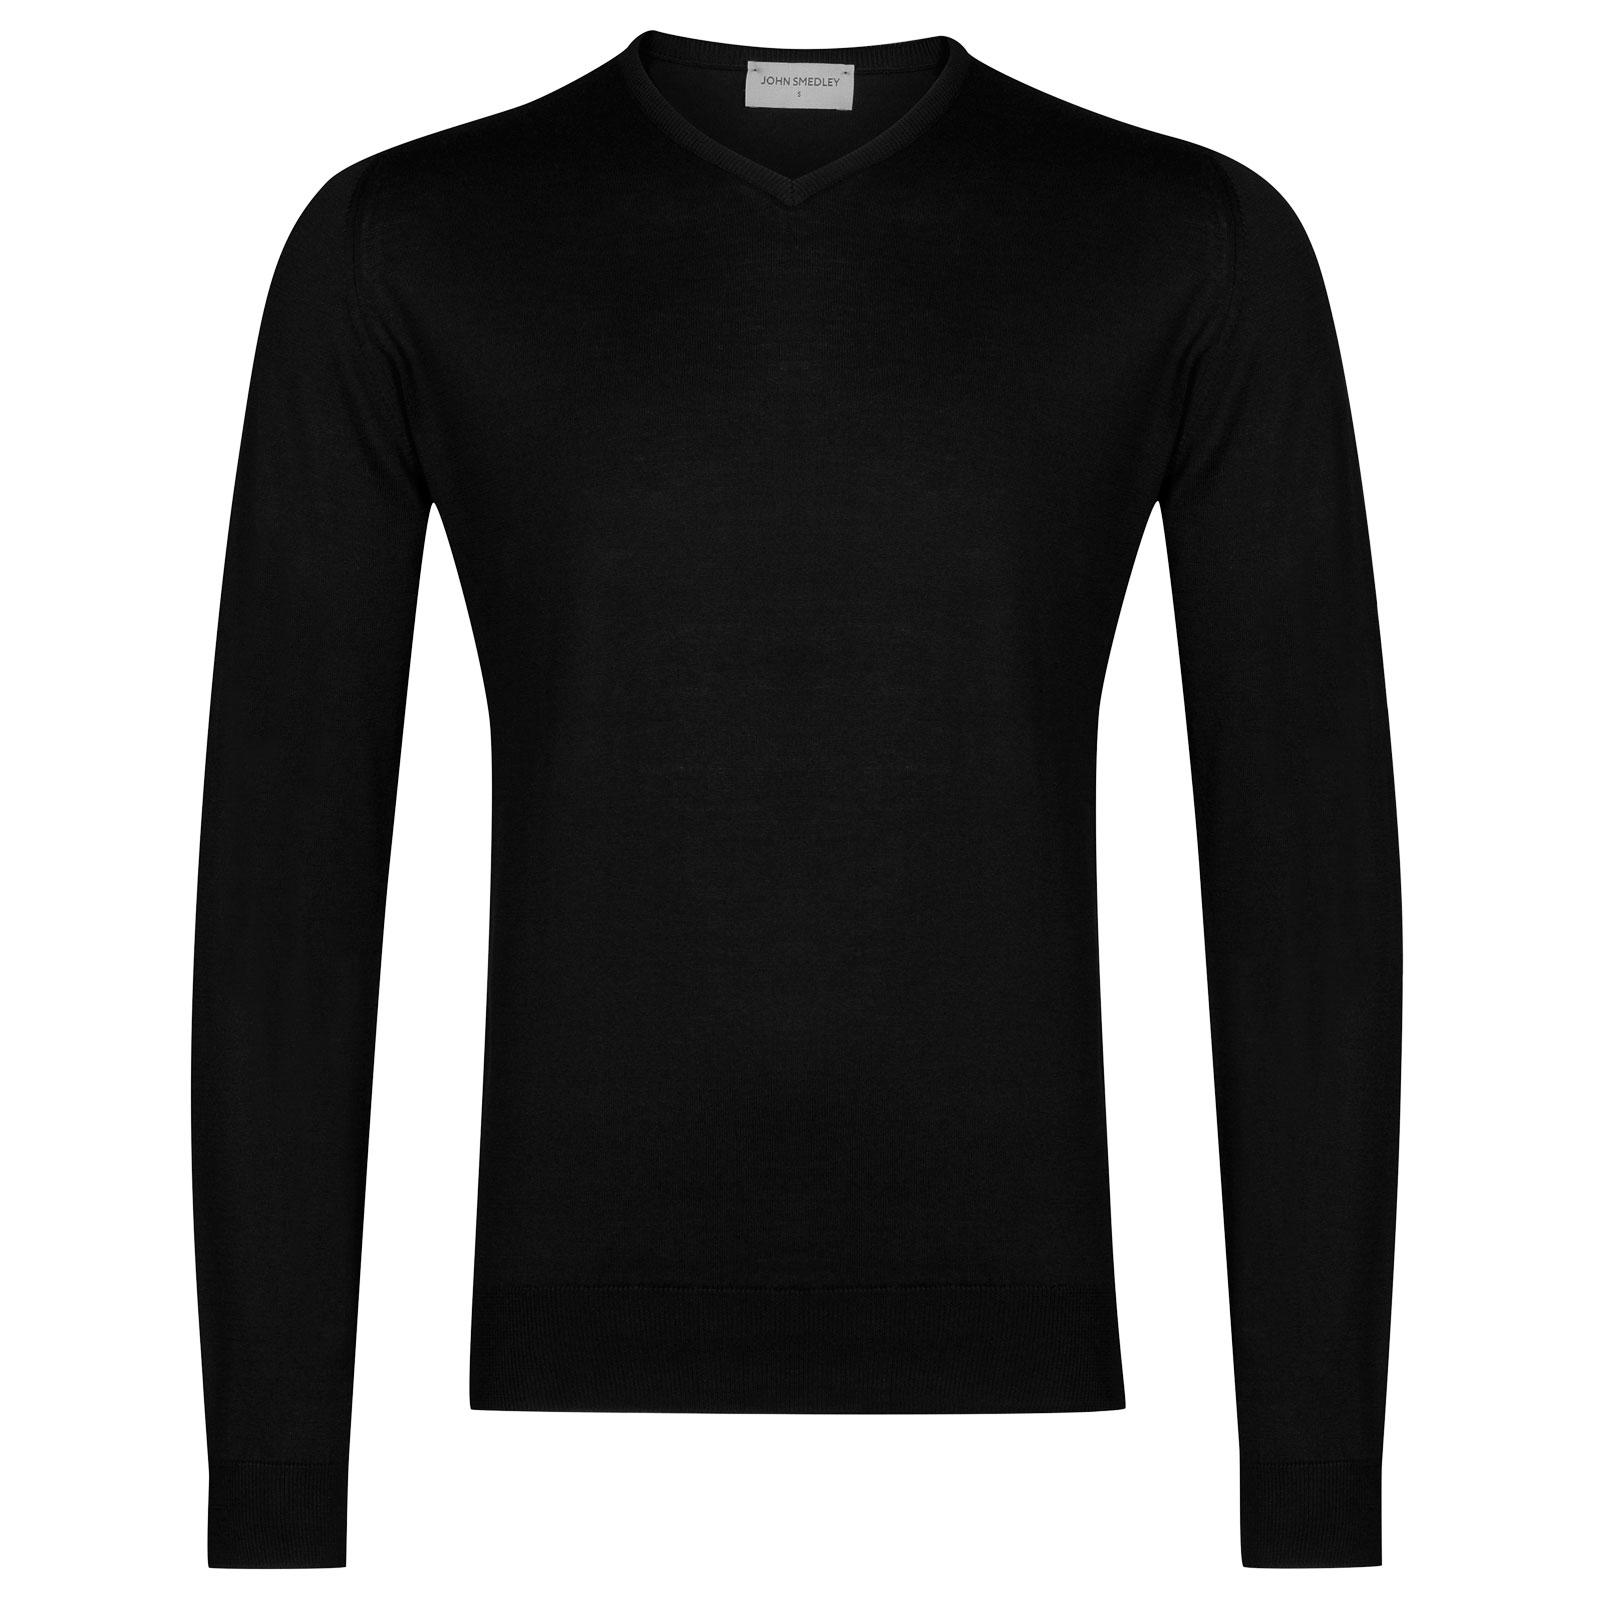 John Smedley Aydon Sea Island Cotton Pullover in Black-XL